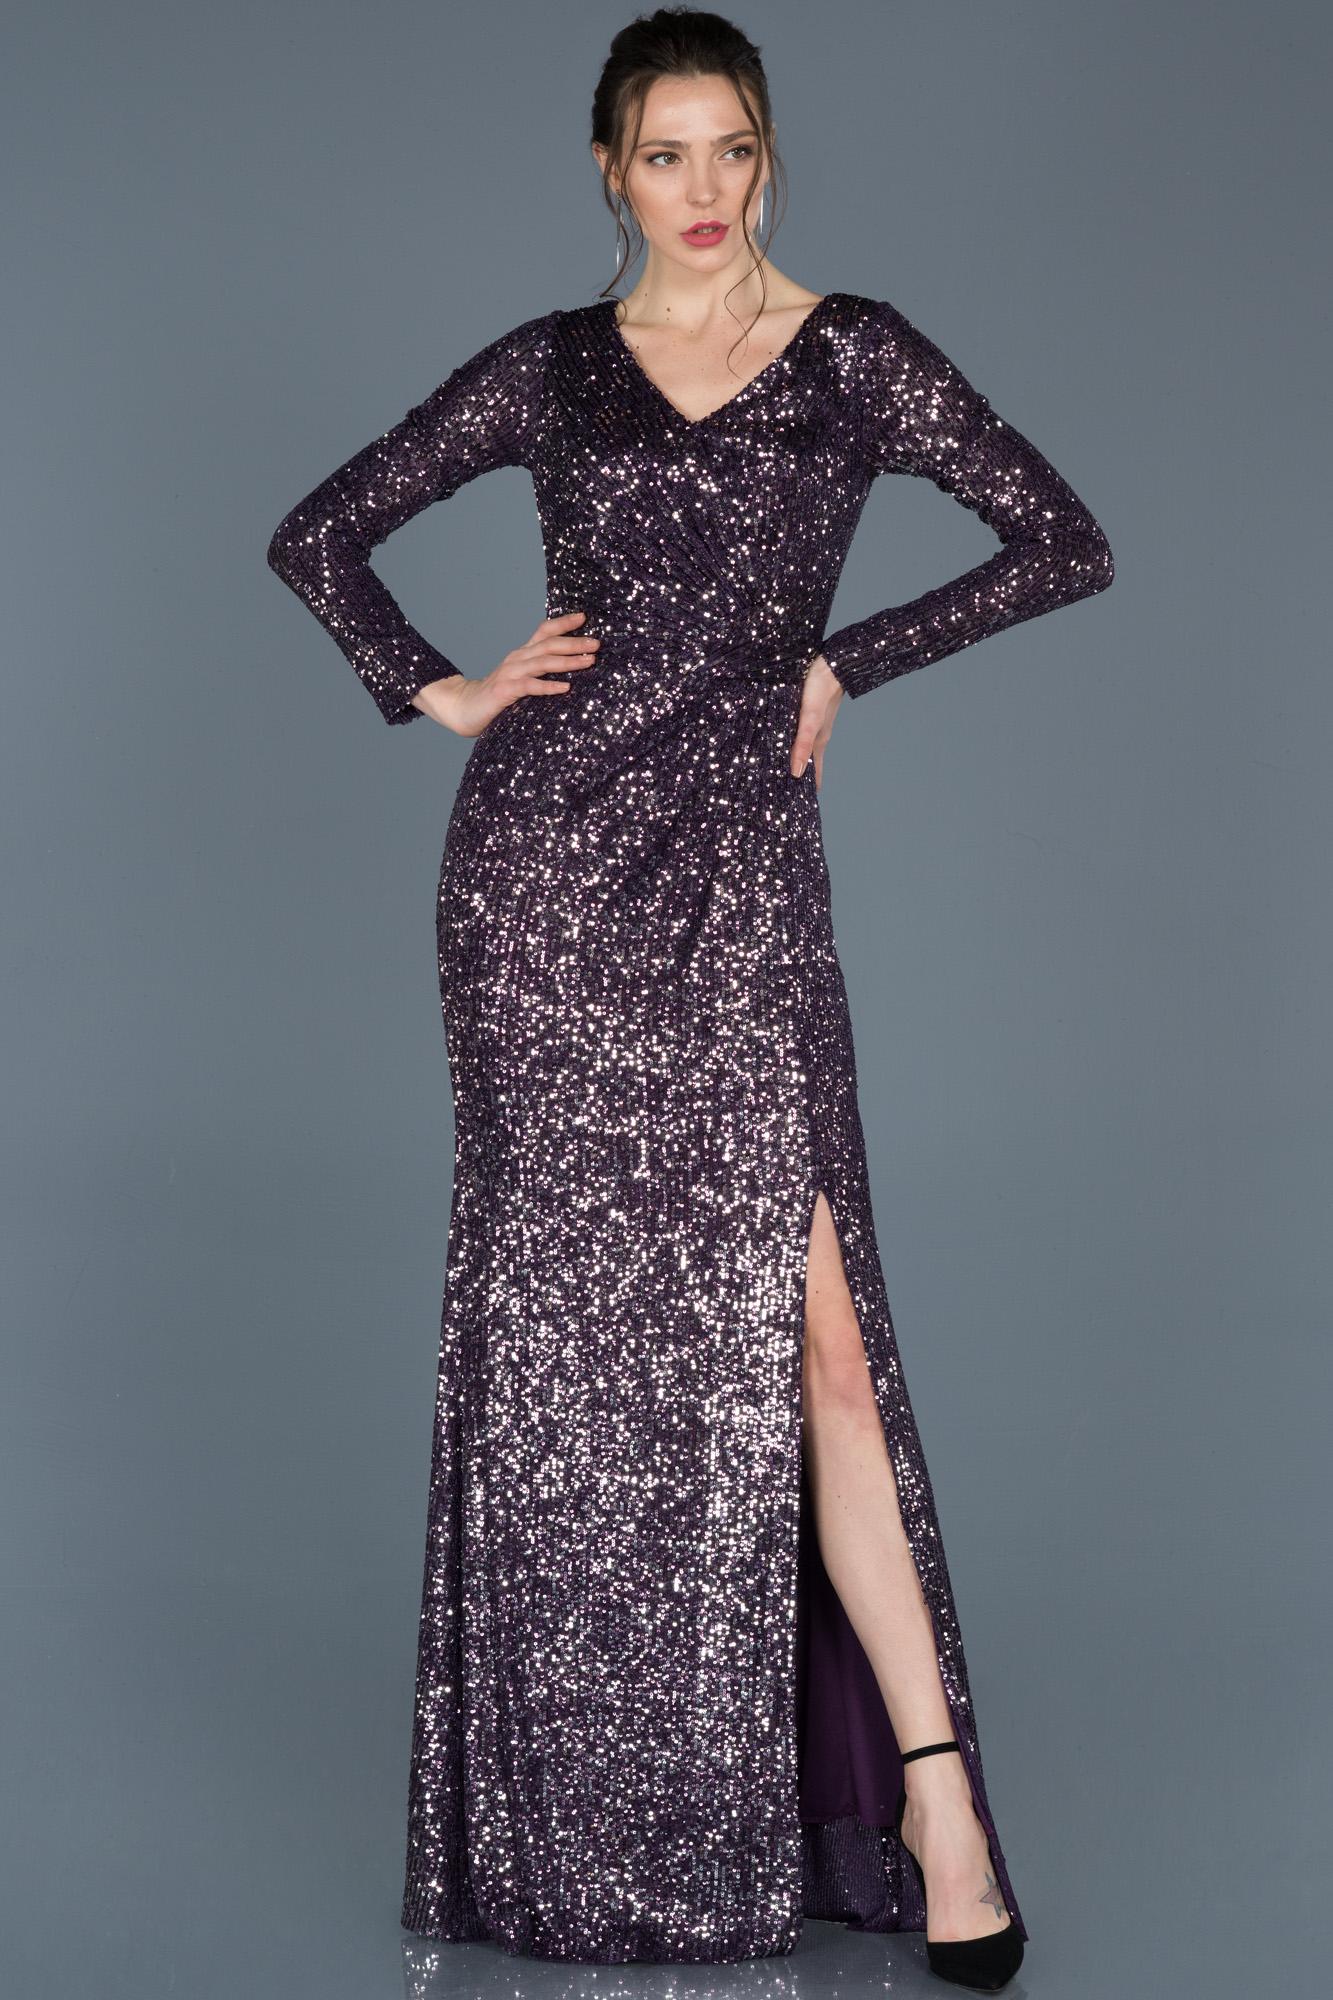 Violet Uzun Kollu Payetli Davet Elbisesi